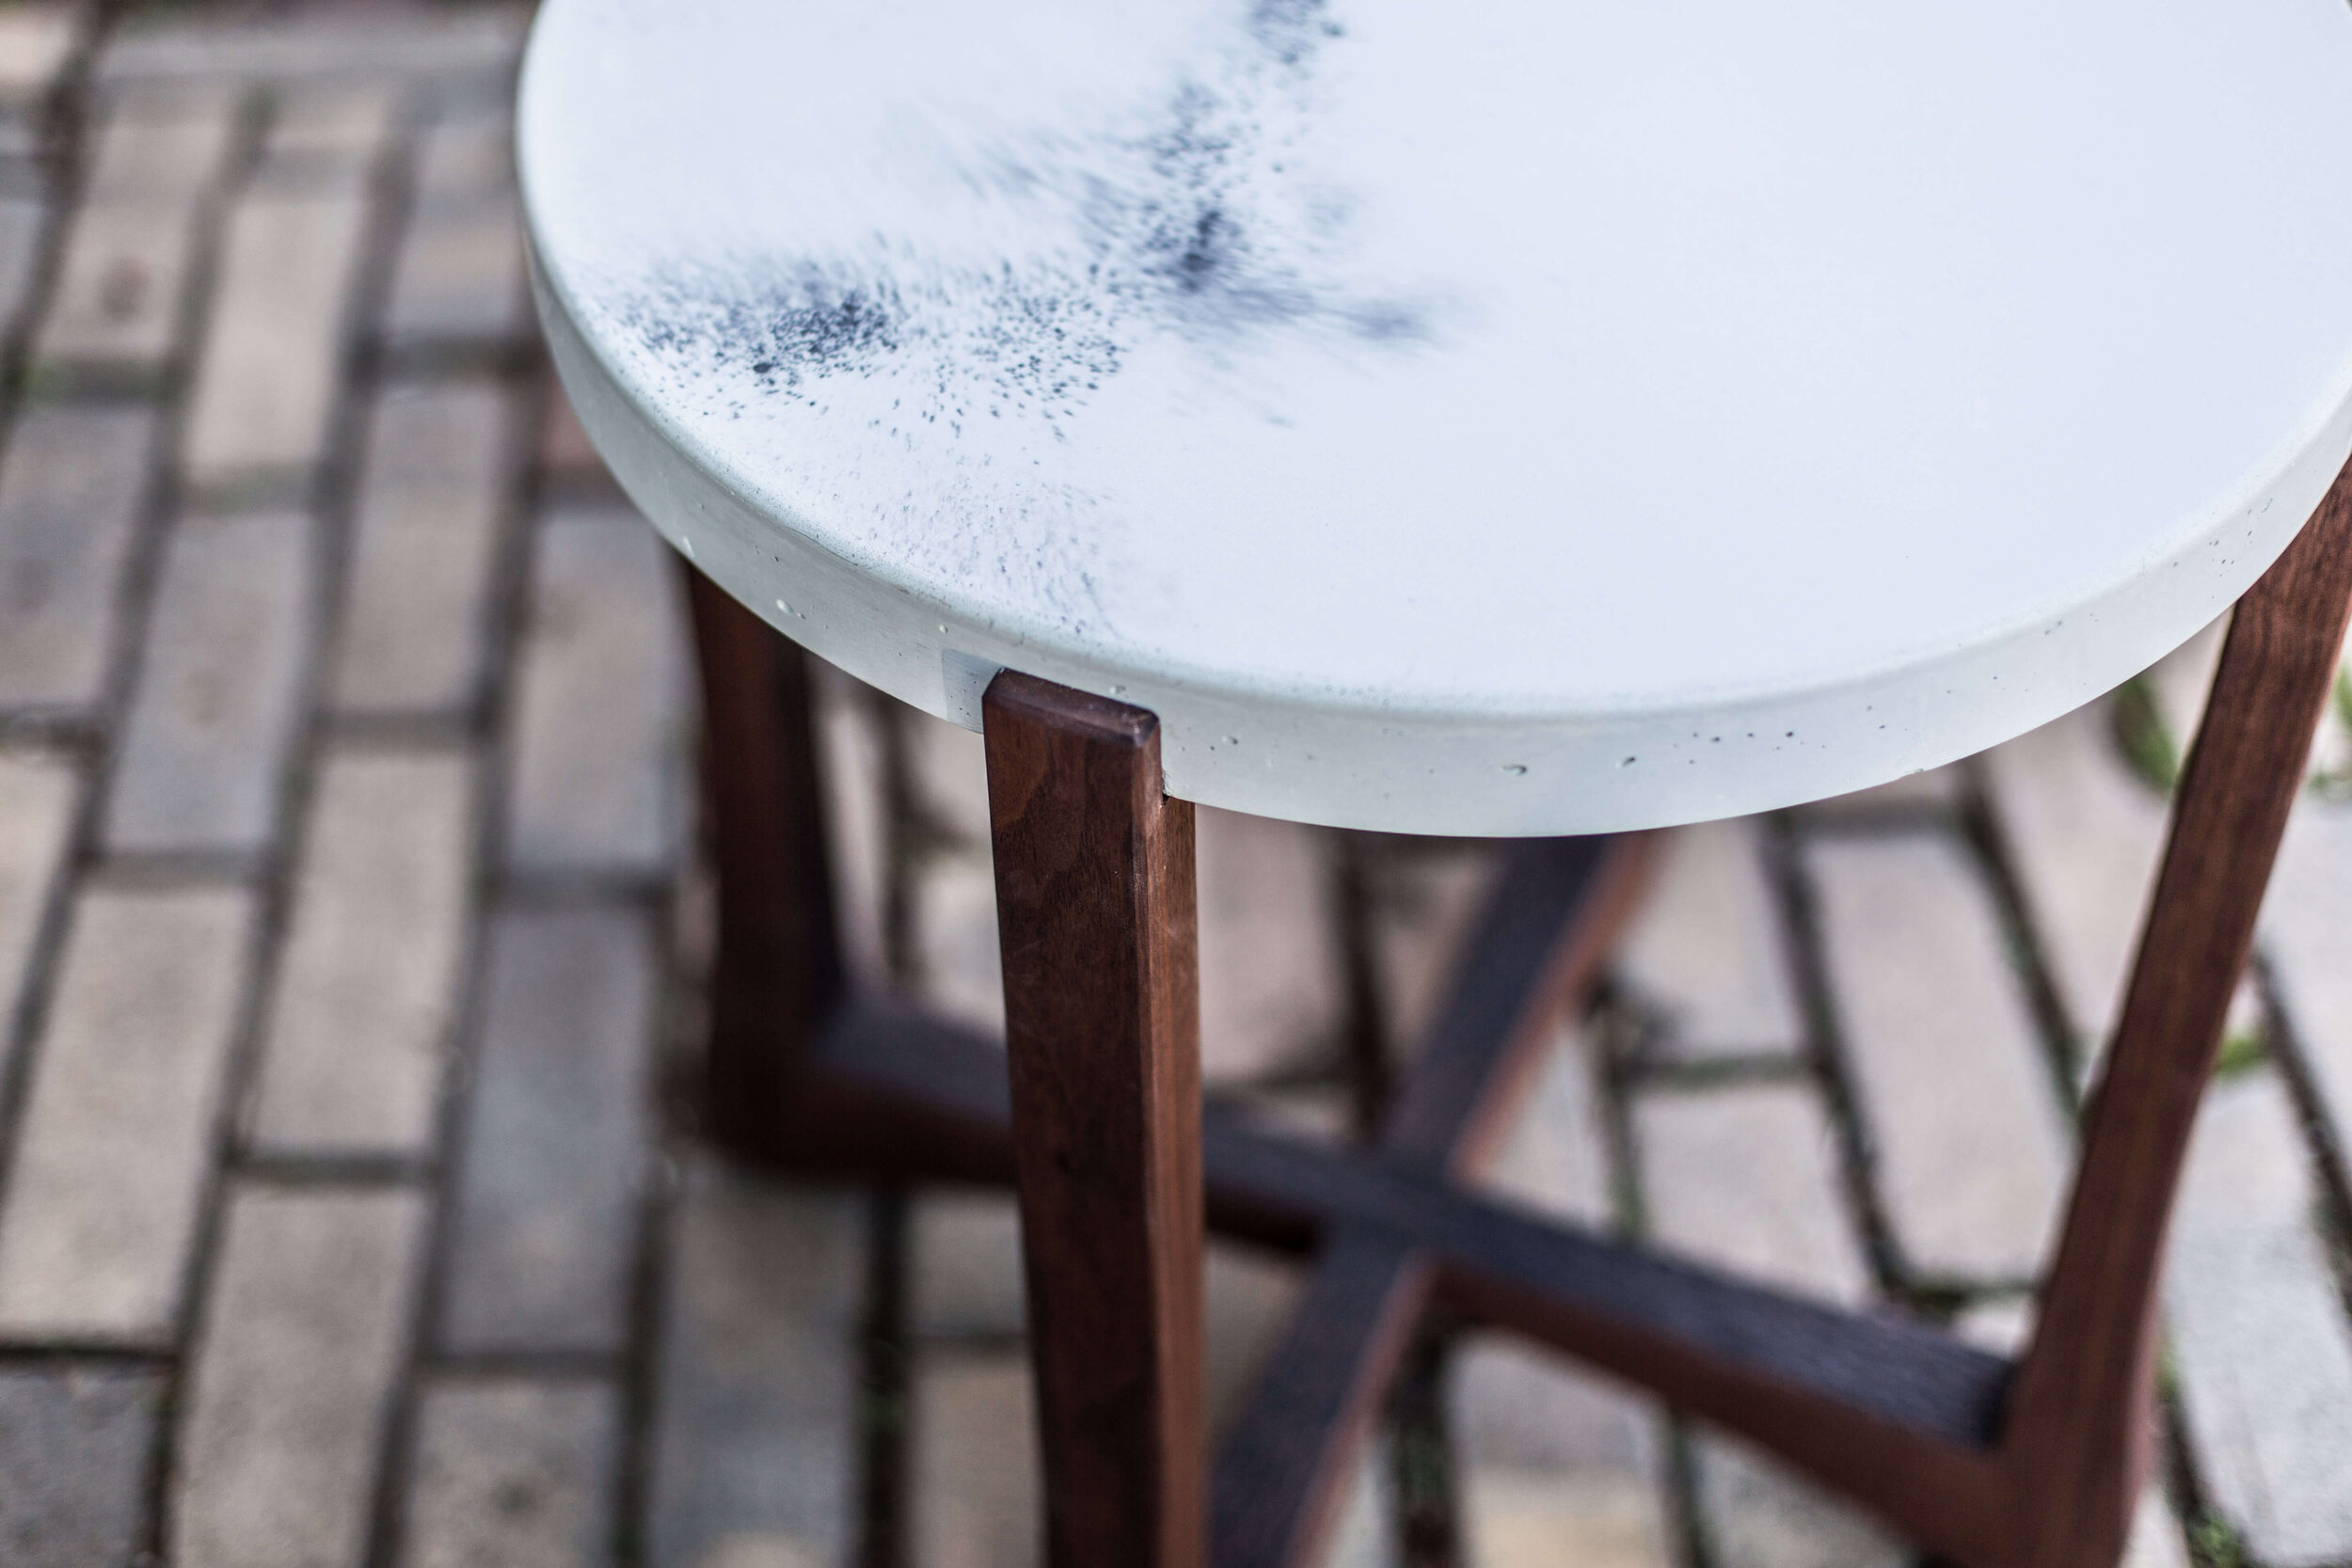 Alicia_Dietz_Modern_Concrete_Furniture_Carved_Wood_End_Table_Sofa_Table_Richmond_VA_8